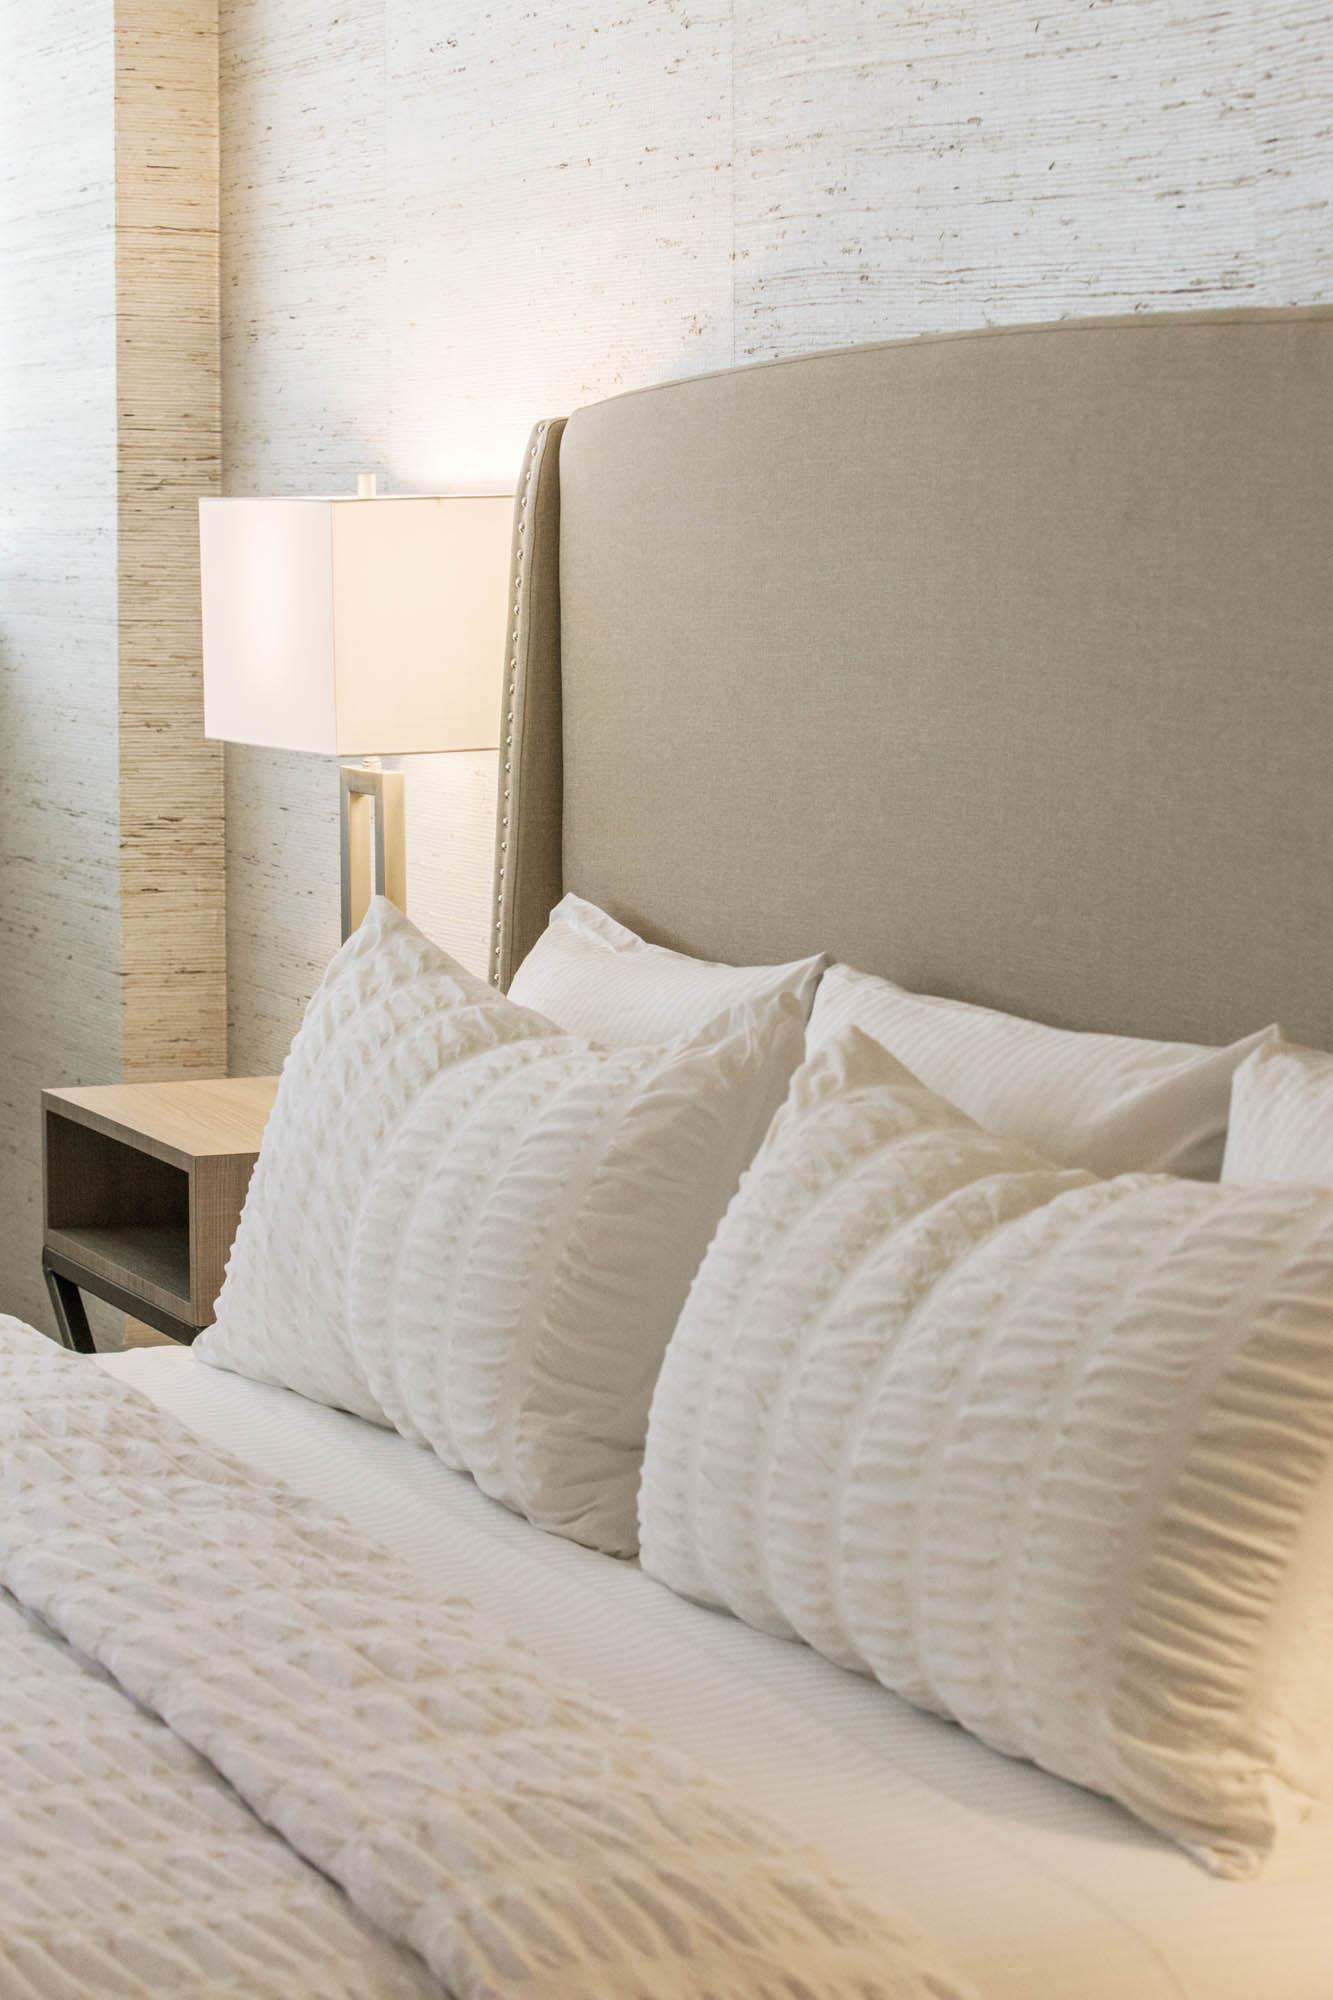 Rushmore Hotel Rapid City Sd